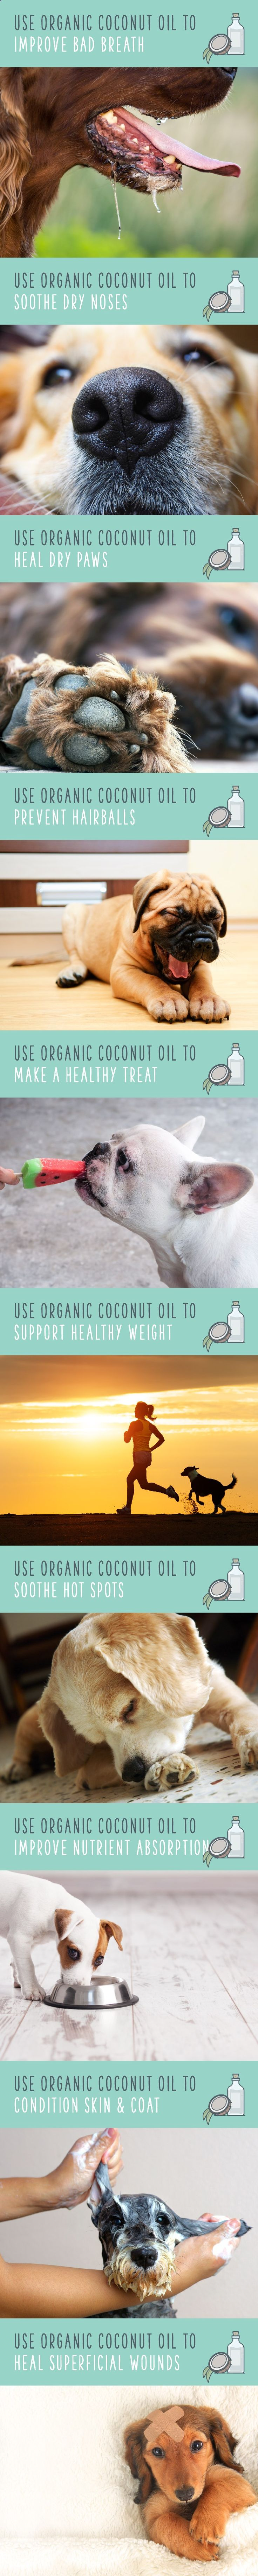 623 best Dog Health images on Pinterest